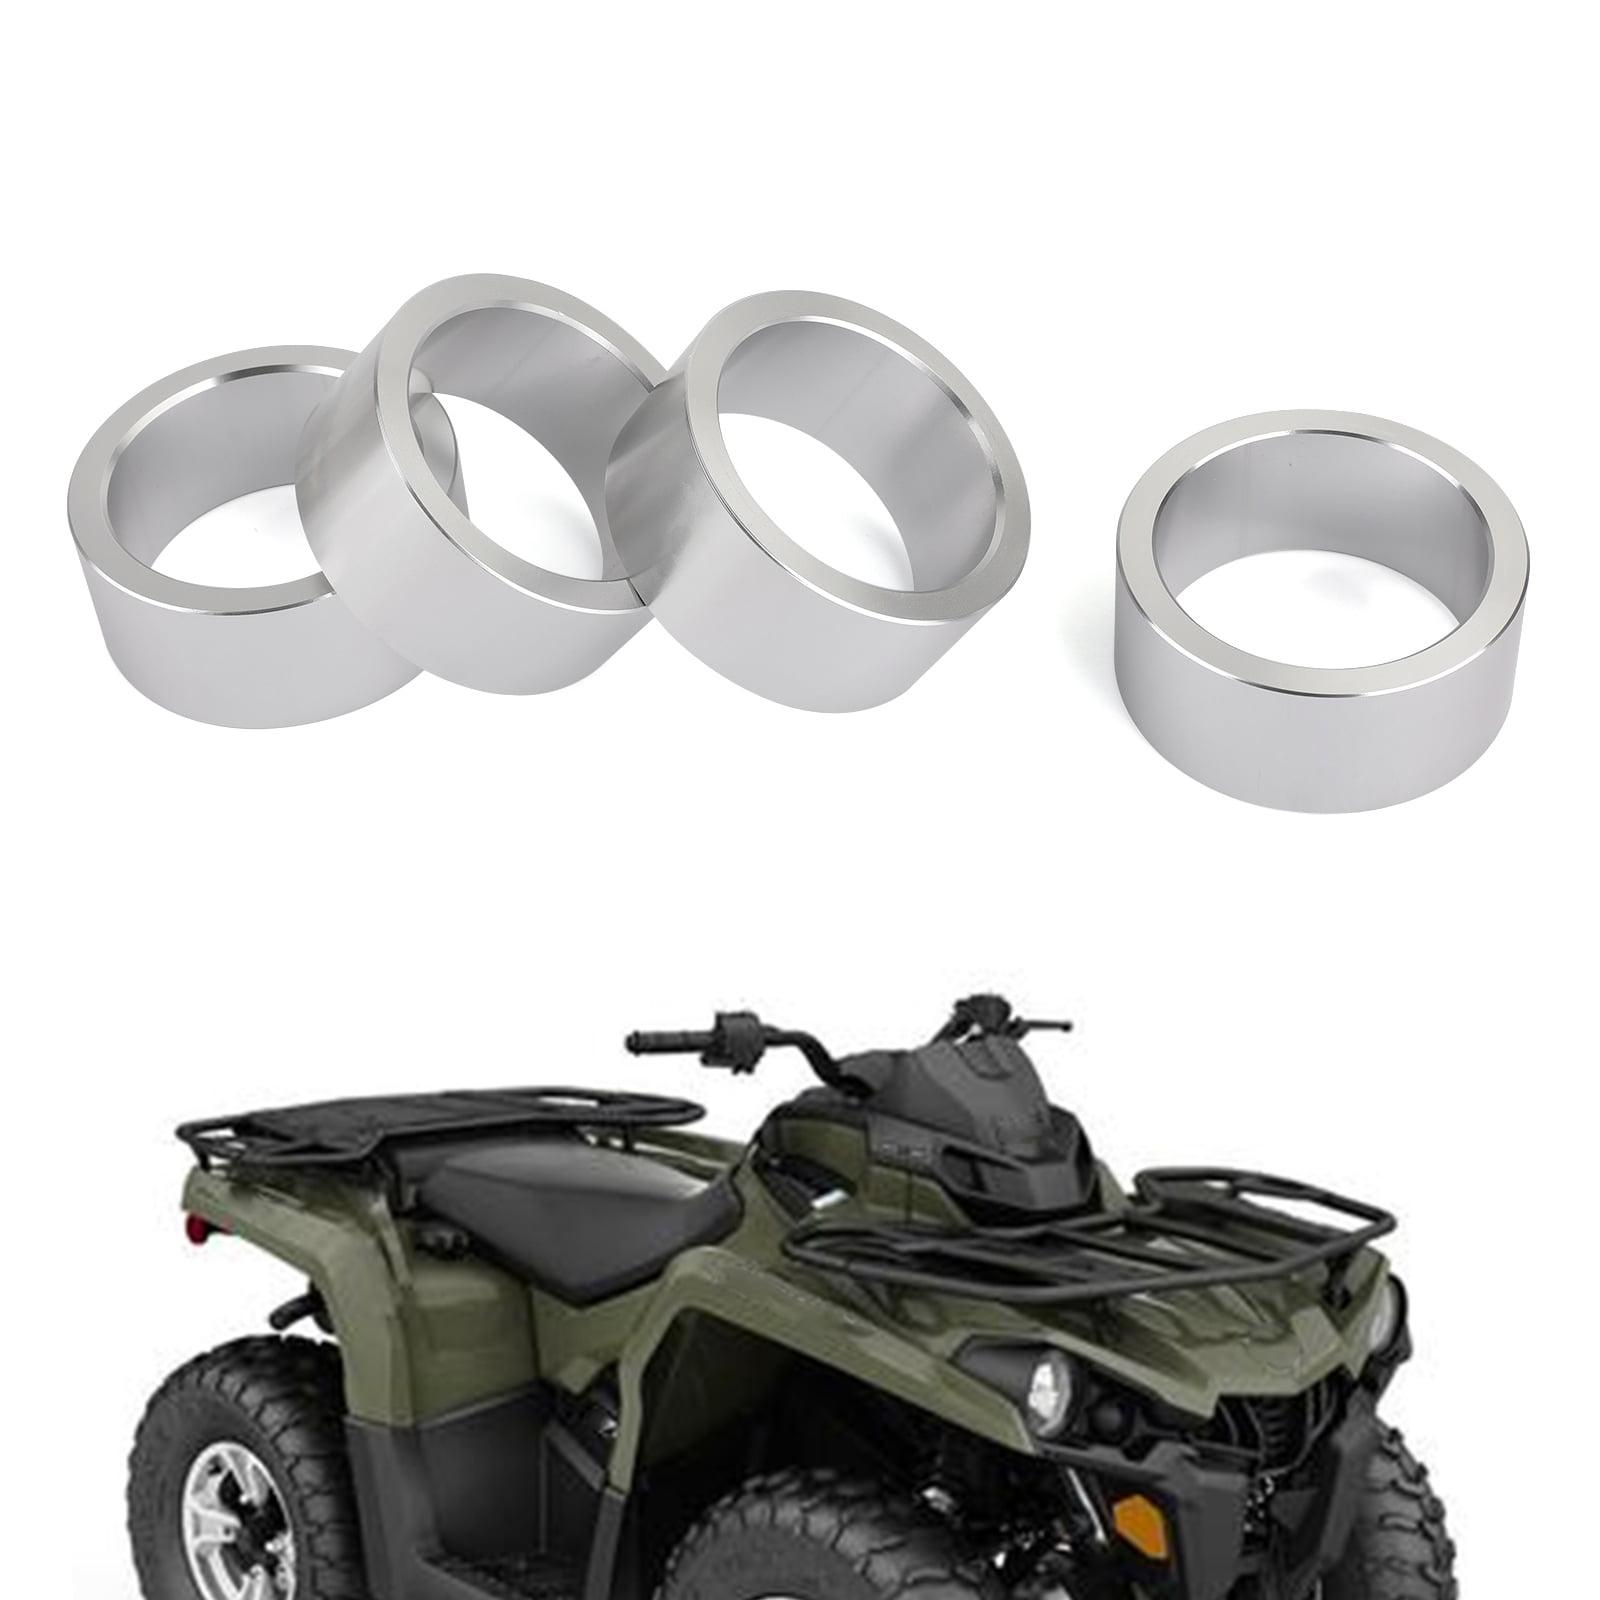 Bruce /& Shark Motorcycle Rise Suspension Lift Spacer Kit for Bom-bardier for CAN-AM Outlander 650 800 ATV Black